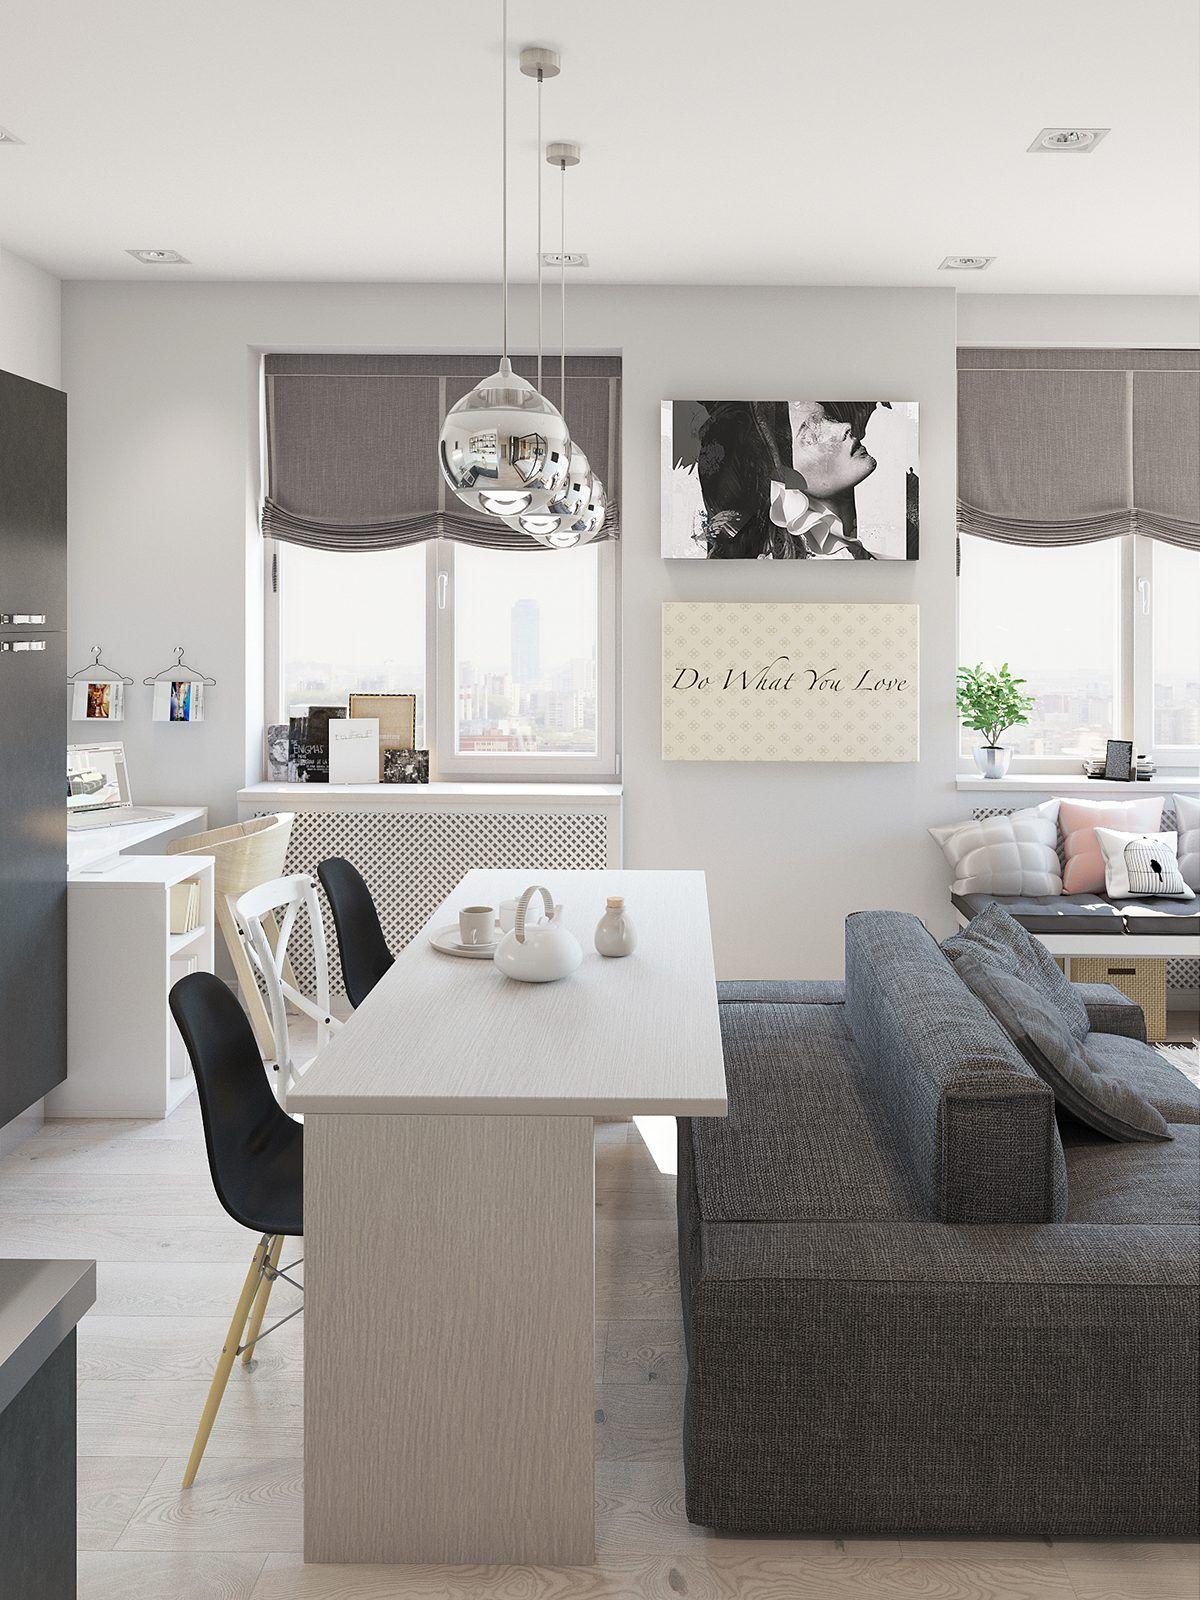 Cute apartment interior design small furniture layout studio also with decorating ideas rh cz pinterest